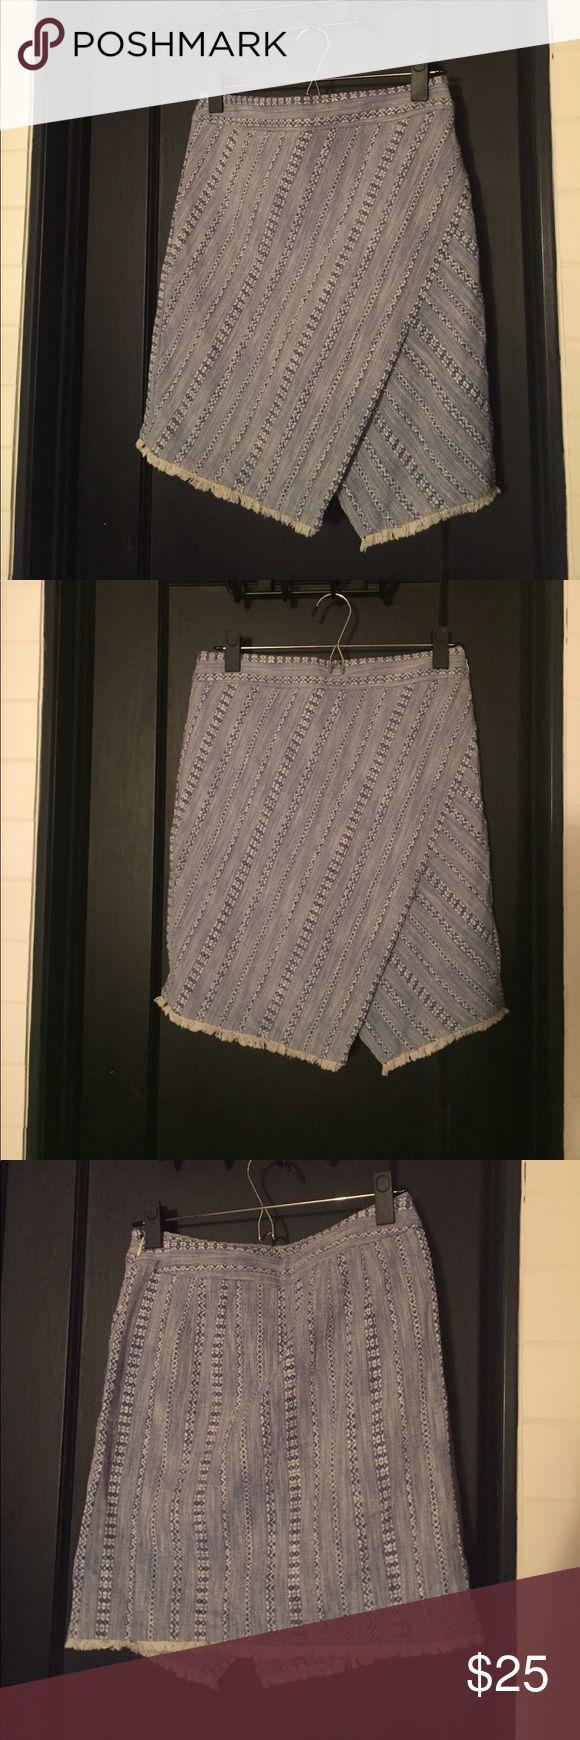 Blue fringe skirt Blue and white skirt with asymmetric slit (still business casual friendly!) and fringe detail LOFT Skirts